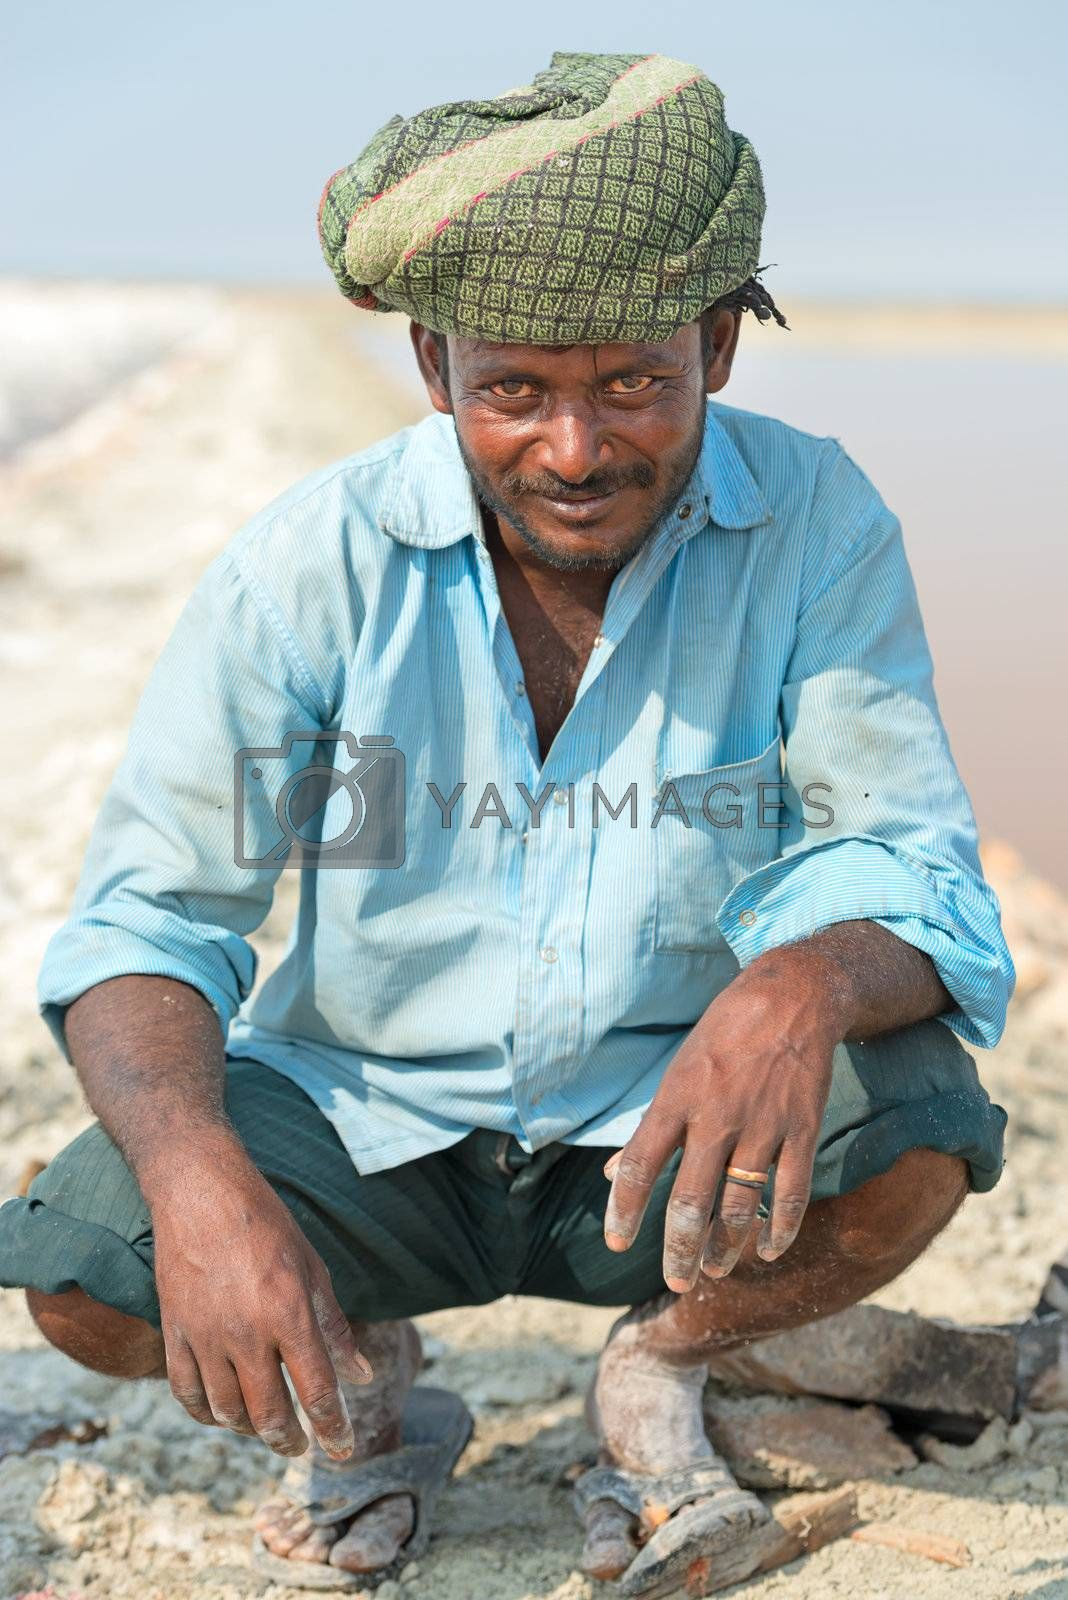 Sambhar, India - Nov 19: Portrait of indian male worker in salt farm on Nov 19, 2012 in Sambhar Salt Lake, India. It is India's largest saline lake and where salt has been farmed for a thousand years.